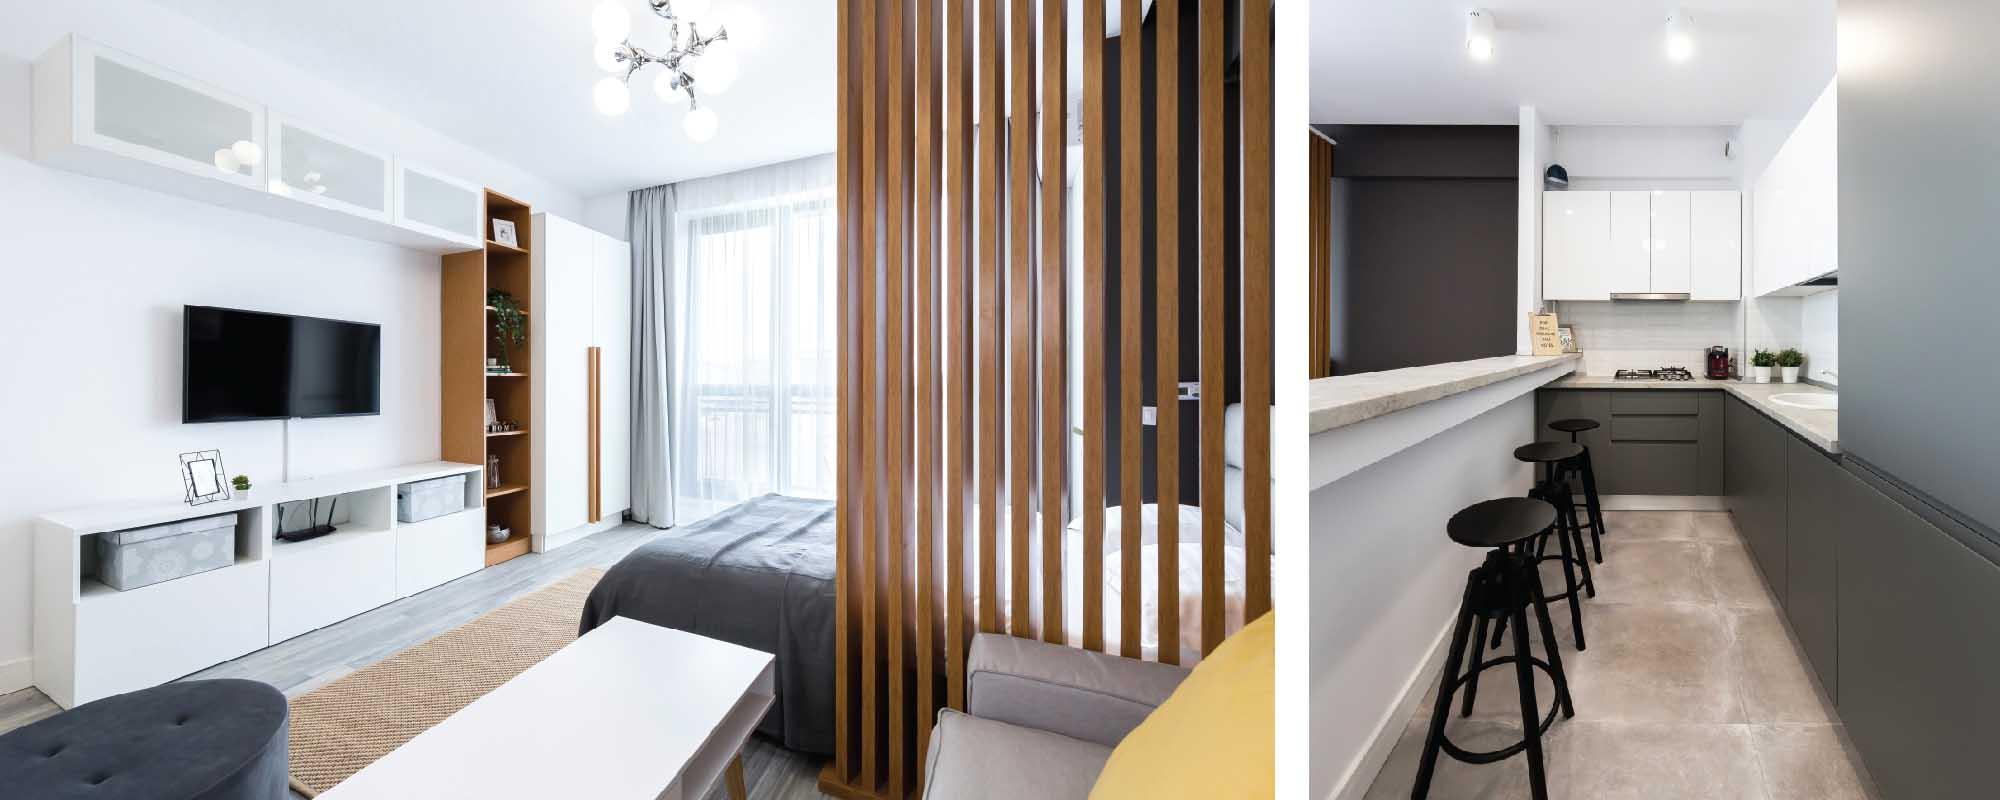 Interioare Urbane arhitect design interior amenajari interioare Slider 3 1